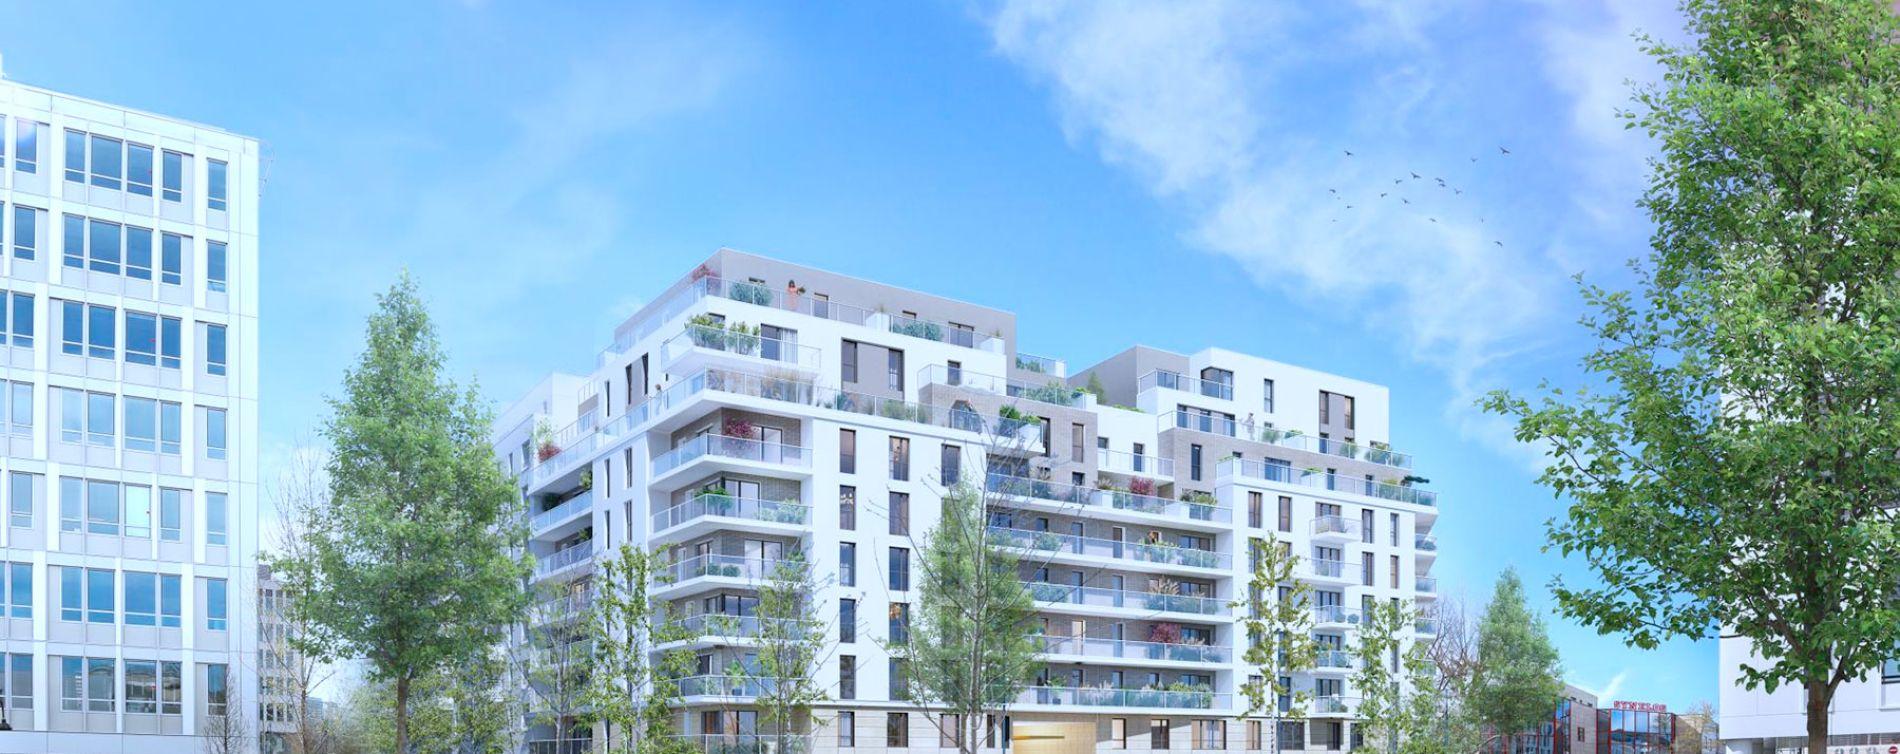 Rueil-Malmaison : programme immobilier neuve « 6 rue Paul Heroult » (2)